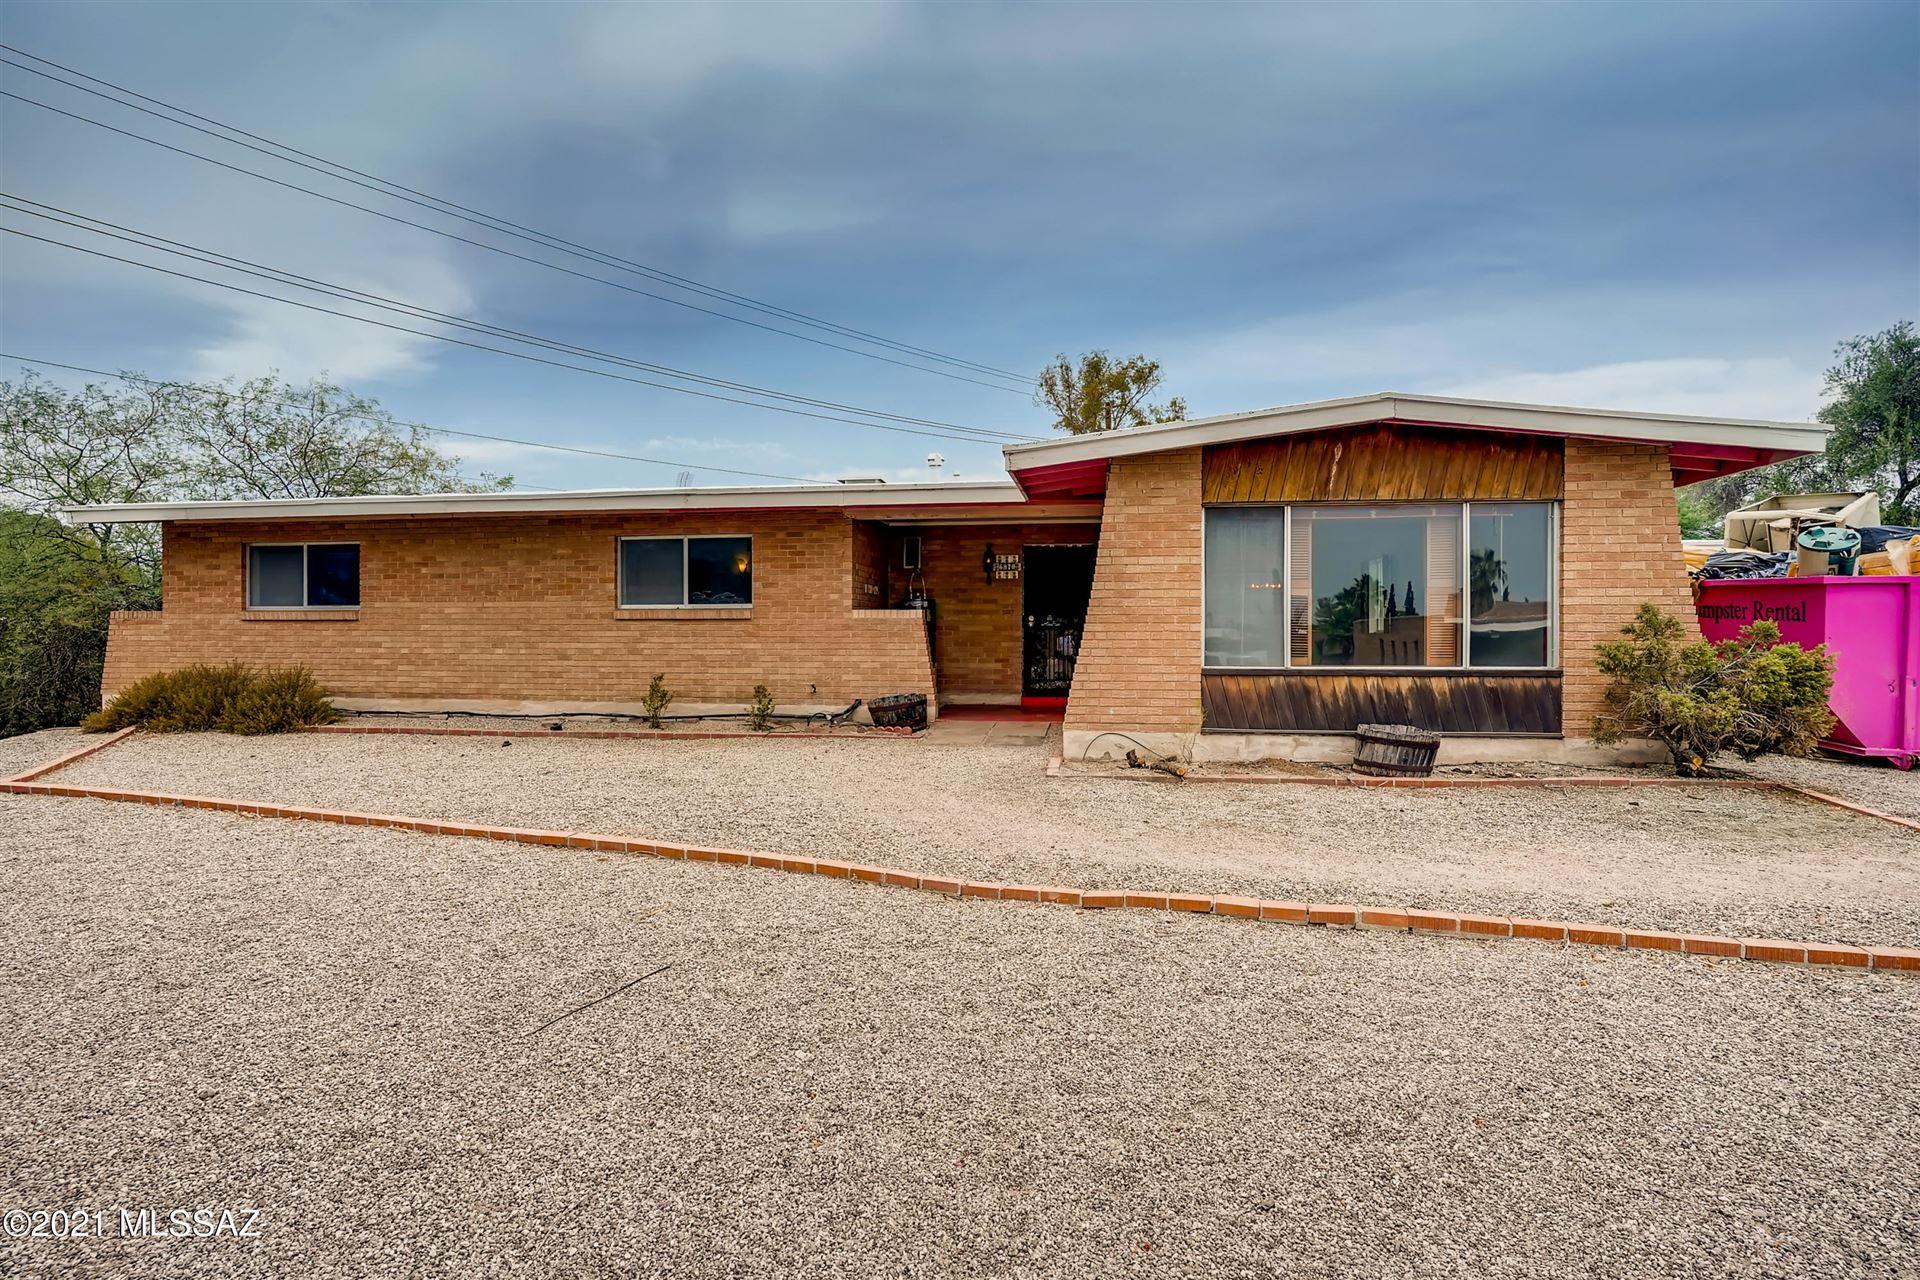 6870 E Rosewood Circle, Tucson, AZ 85710 - MLS#: 22116041